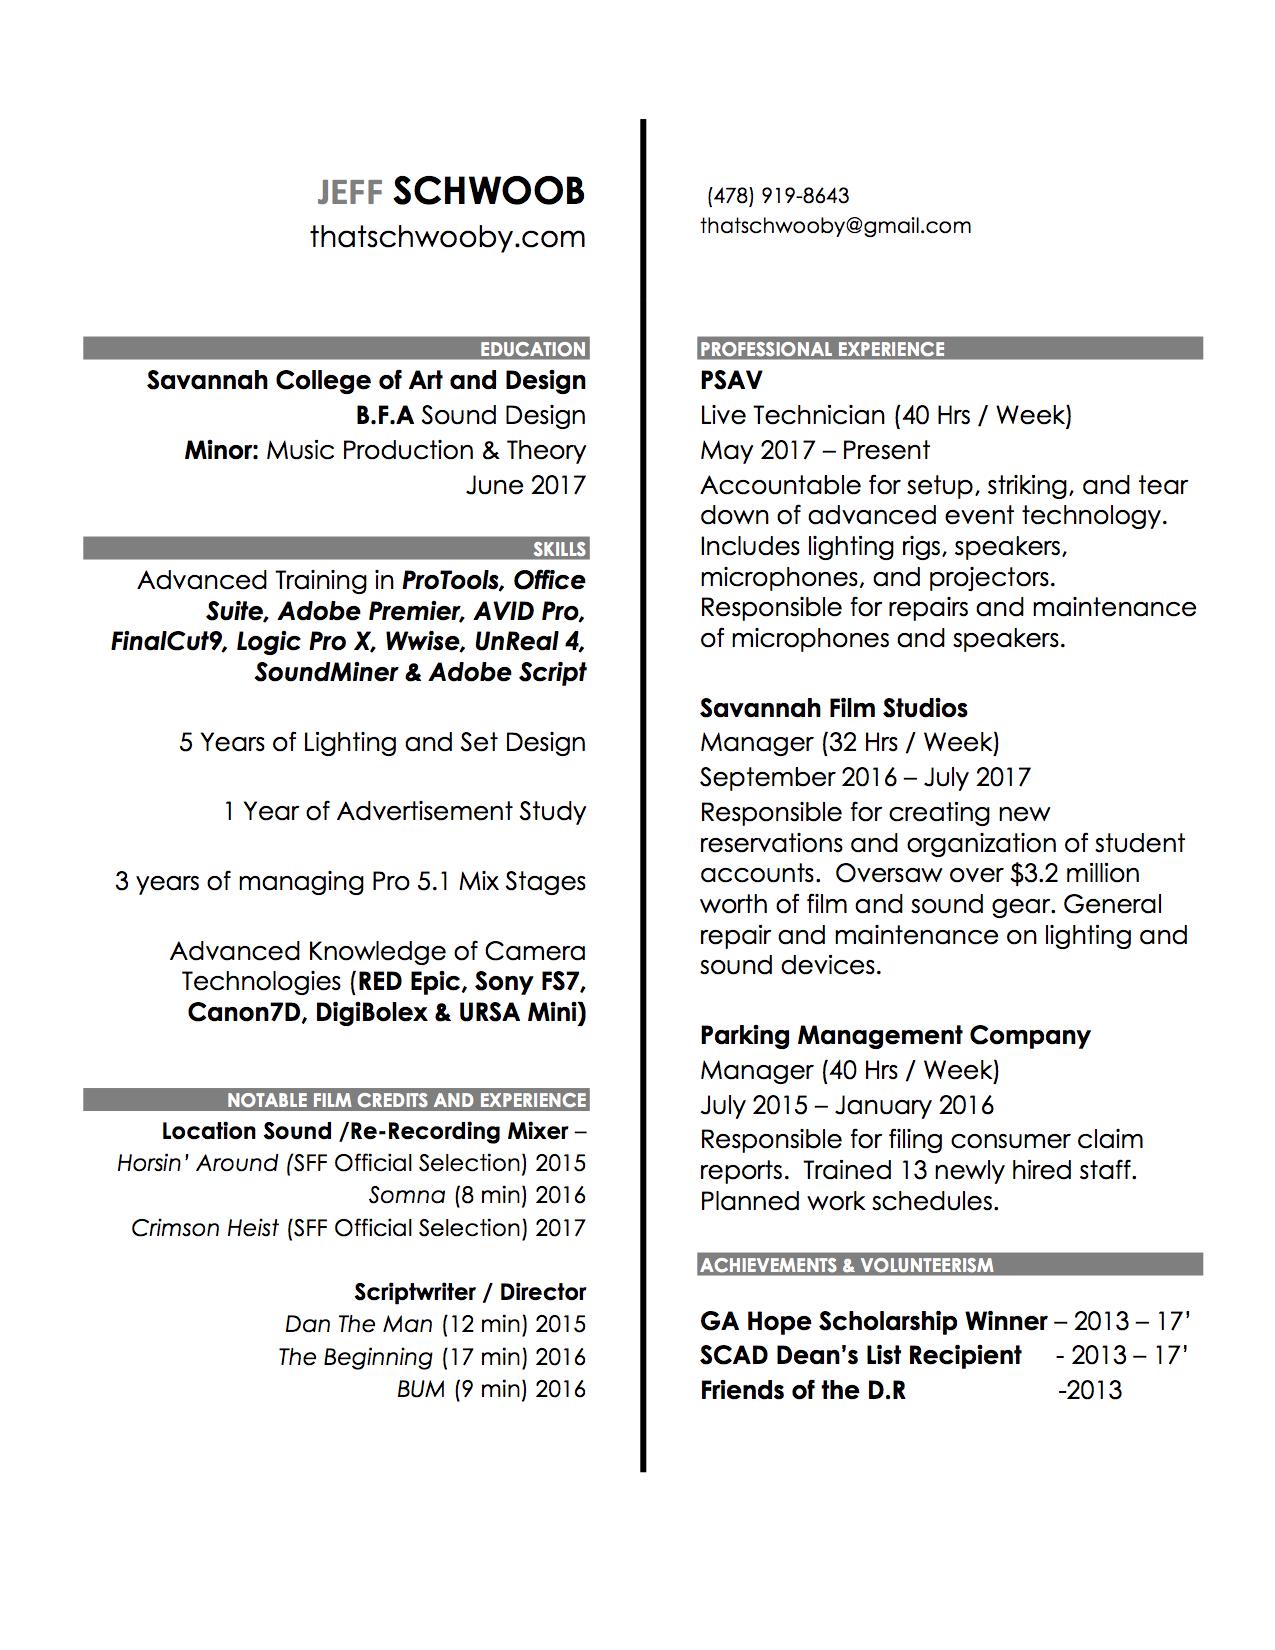 Resume — jeff schwoob